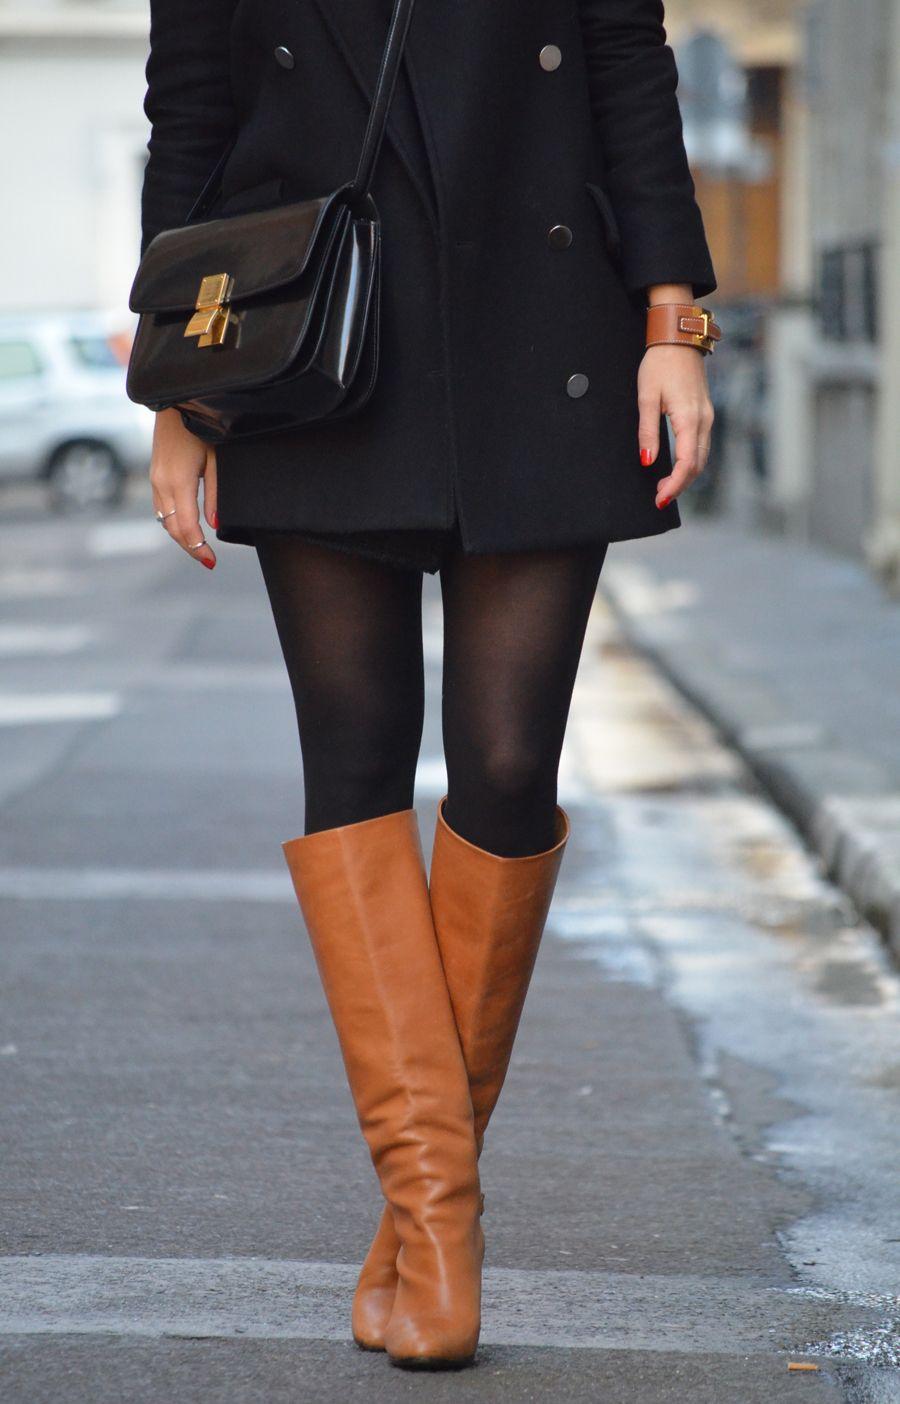 Manteau Mango – pull Gap – jupe Zara – bottes Tara Jarmon – bracelet Hermès  – sac Céline 17723fac82b4